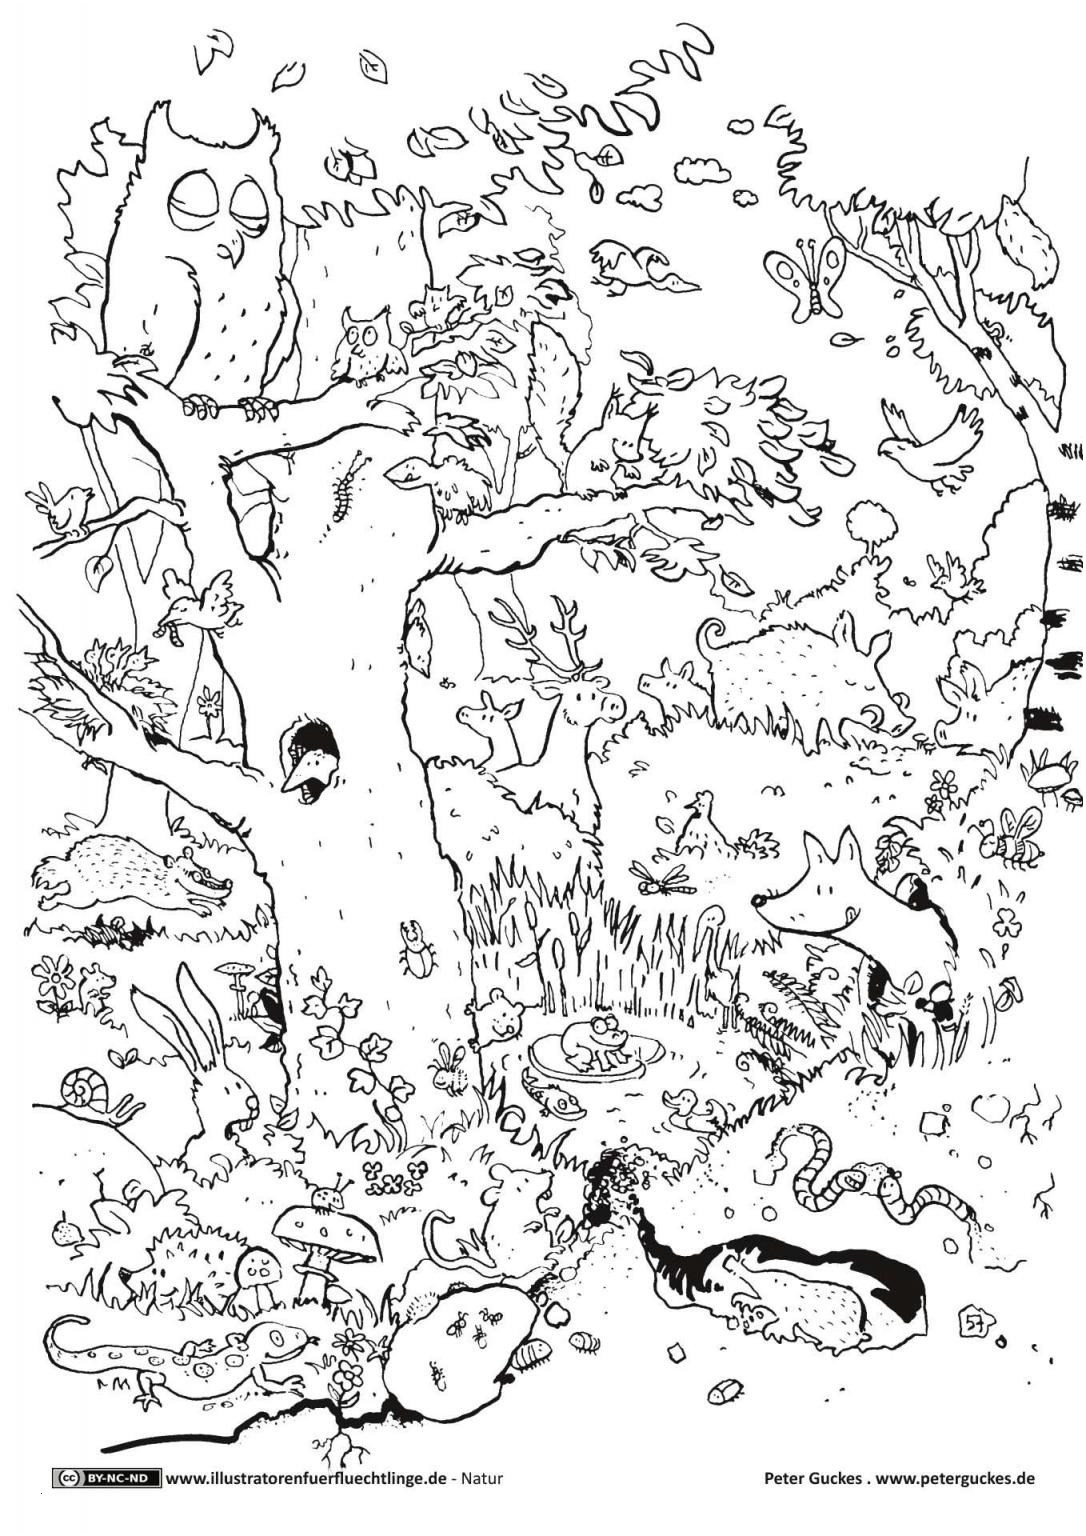 Ausmalbild Robin Hood Neu 34 Lecker Ausmalbild Disney – Große Coloring Page Sammlung Fotos